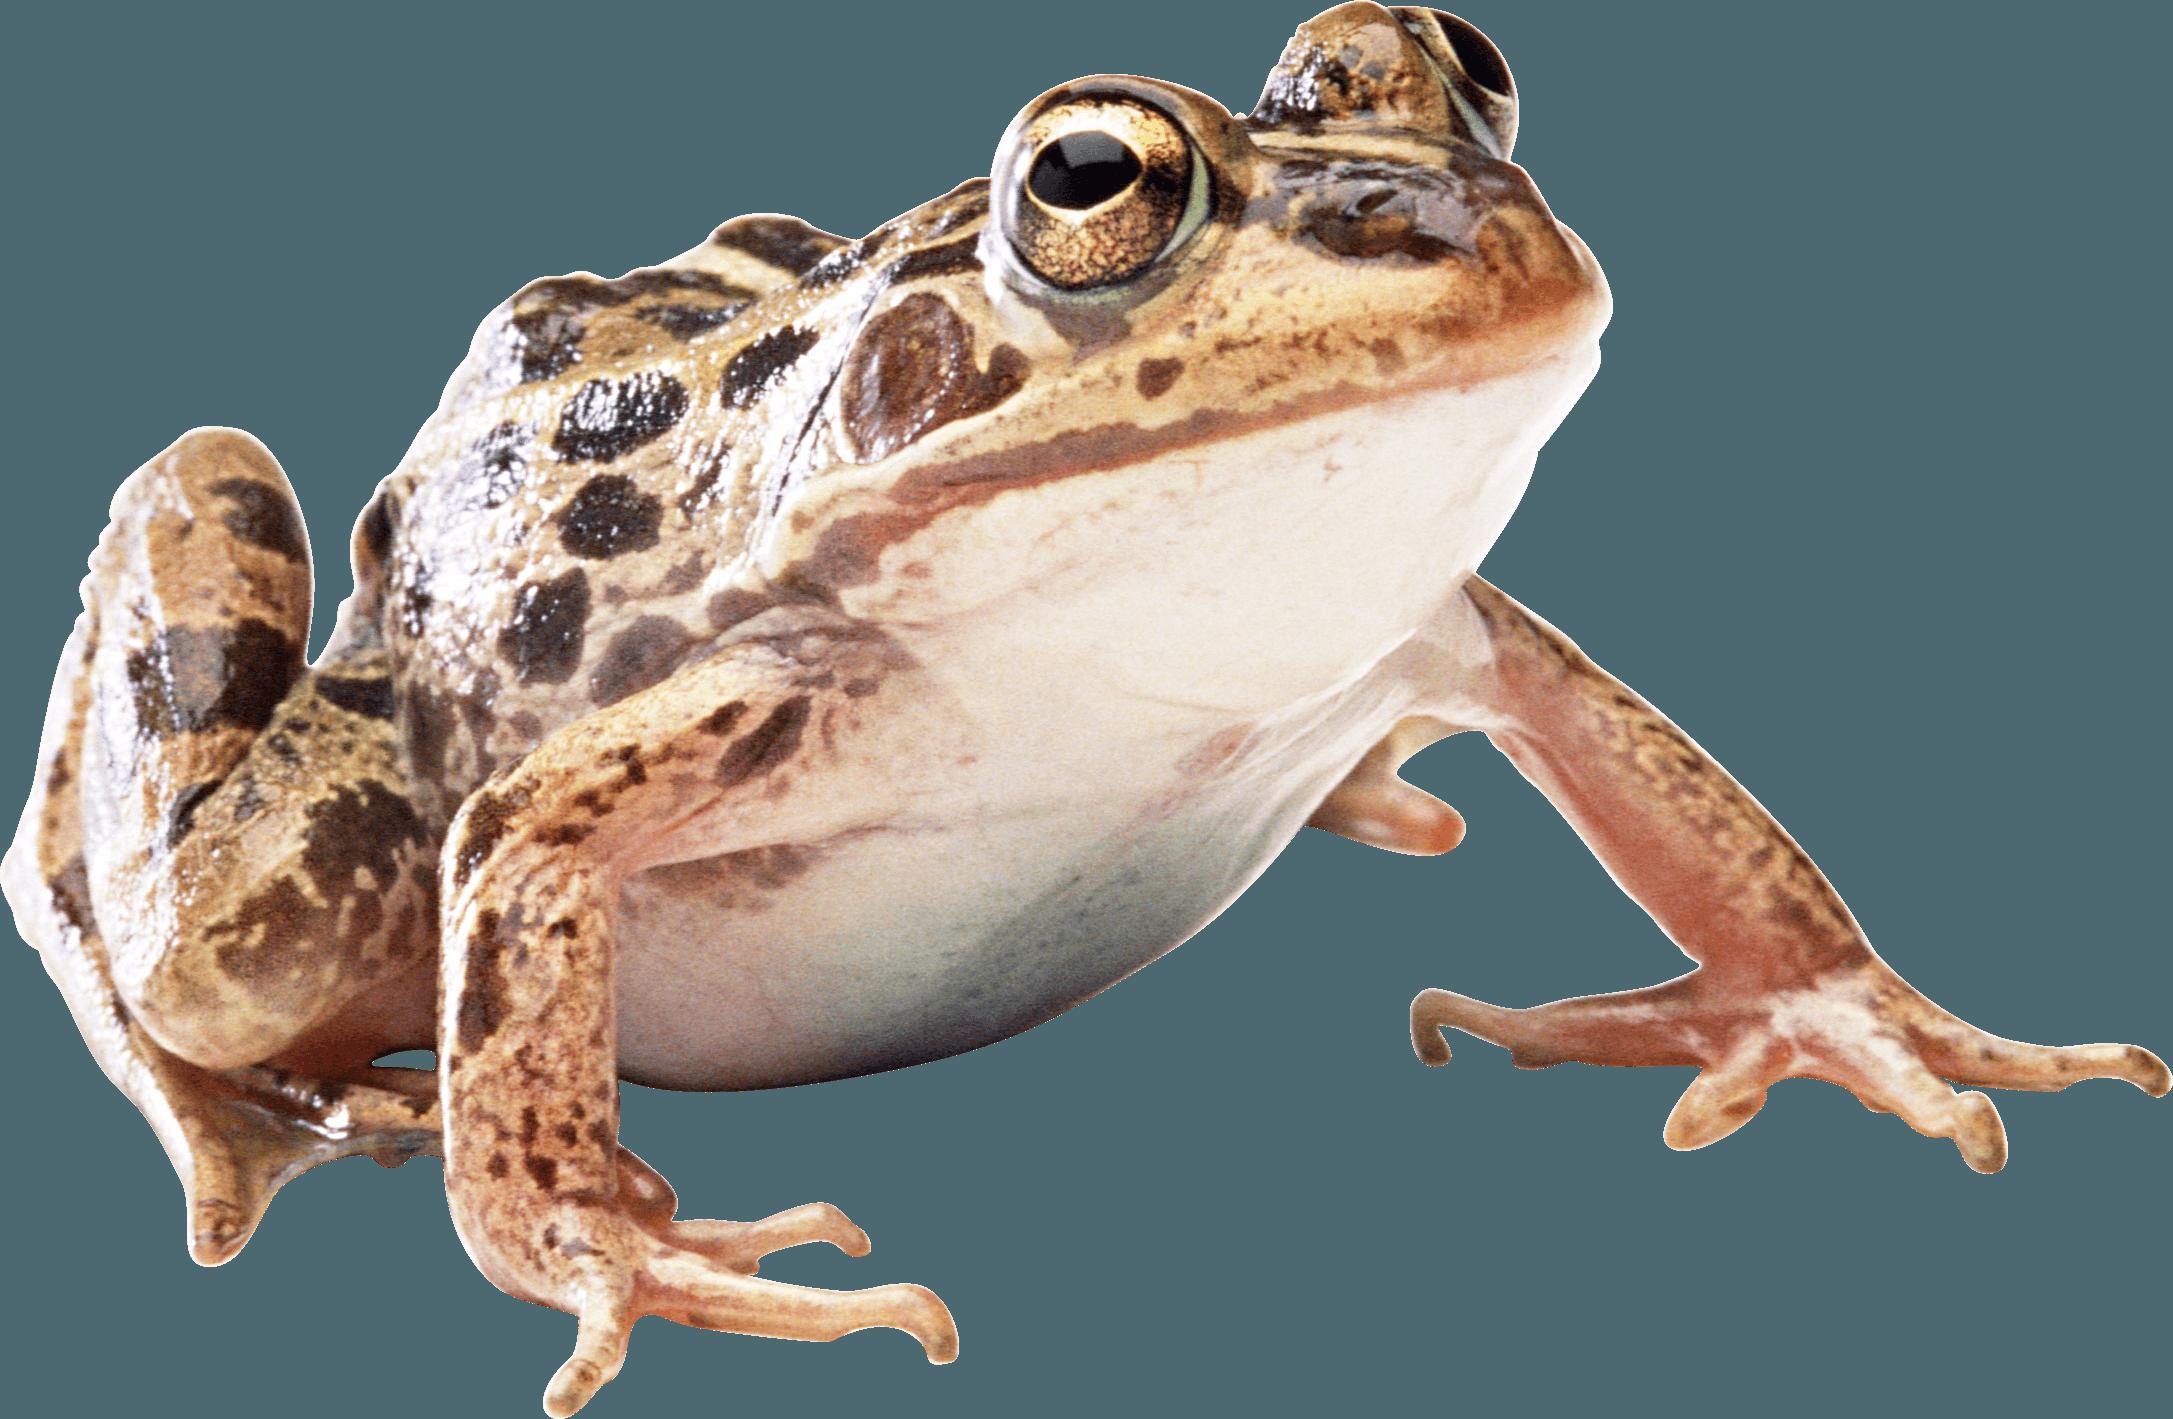 Frog clipart bullfrog. Brown toad png image